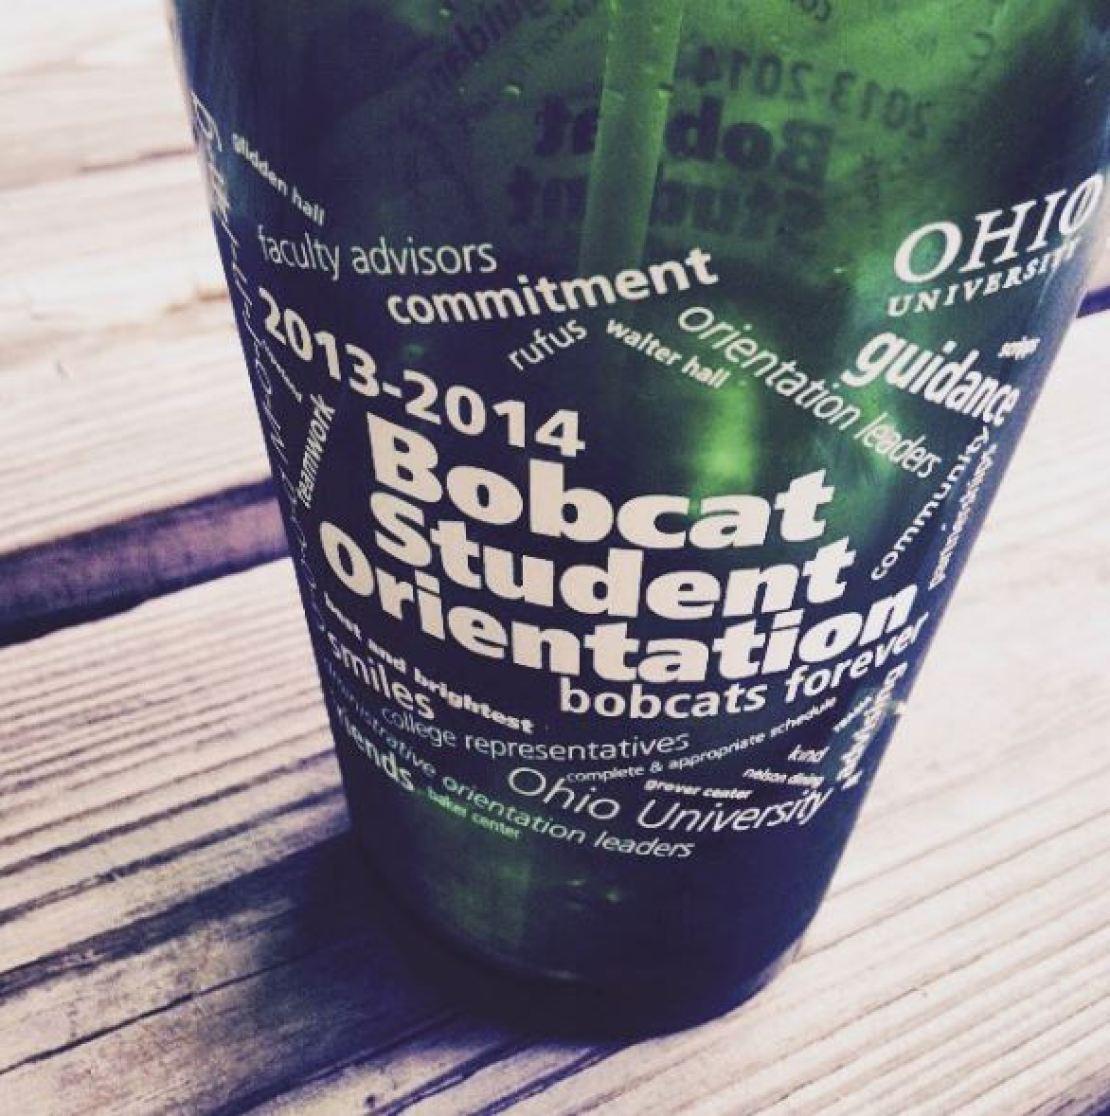 Ohio University orientation